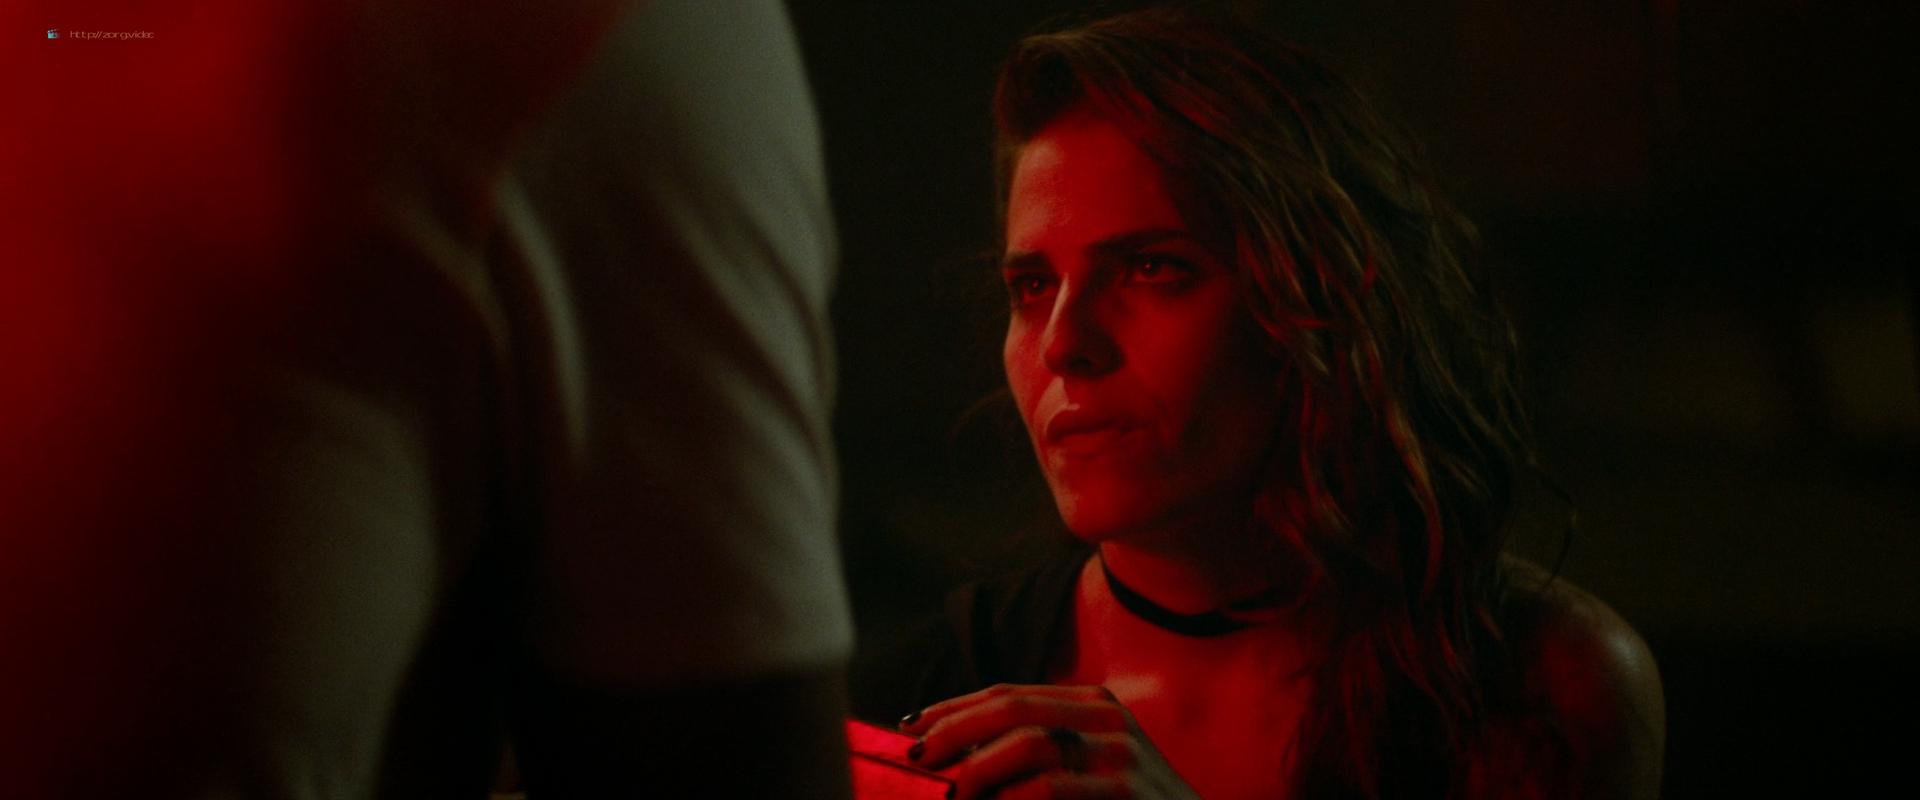 Karla Souza nude hot sex - Jacob's Ladder (2019) HD 1080p (7)